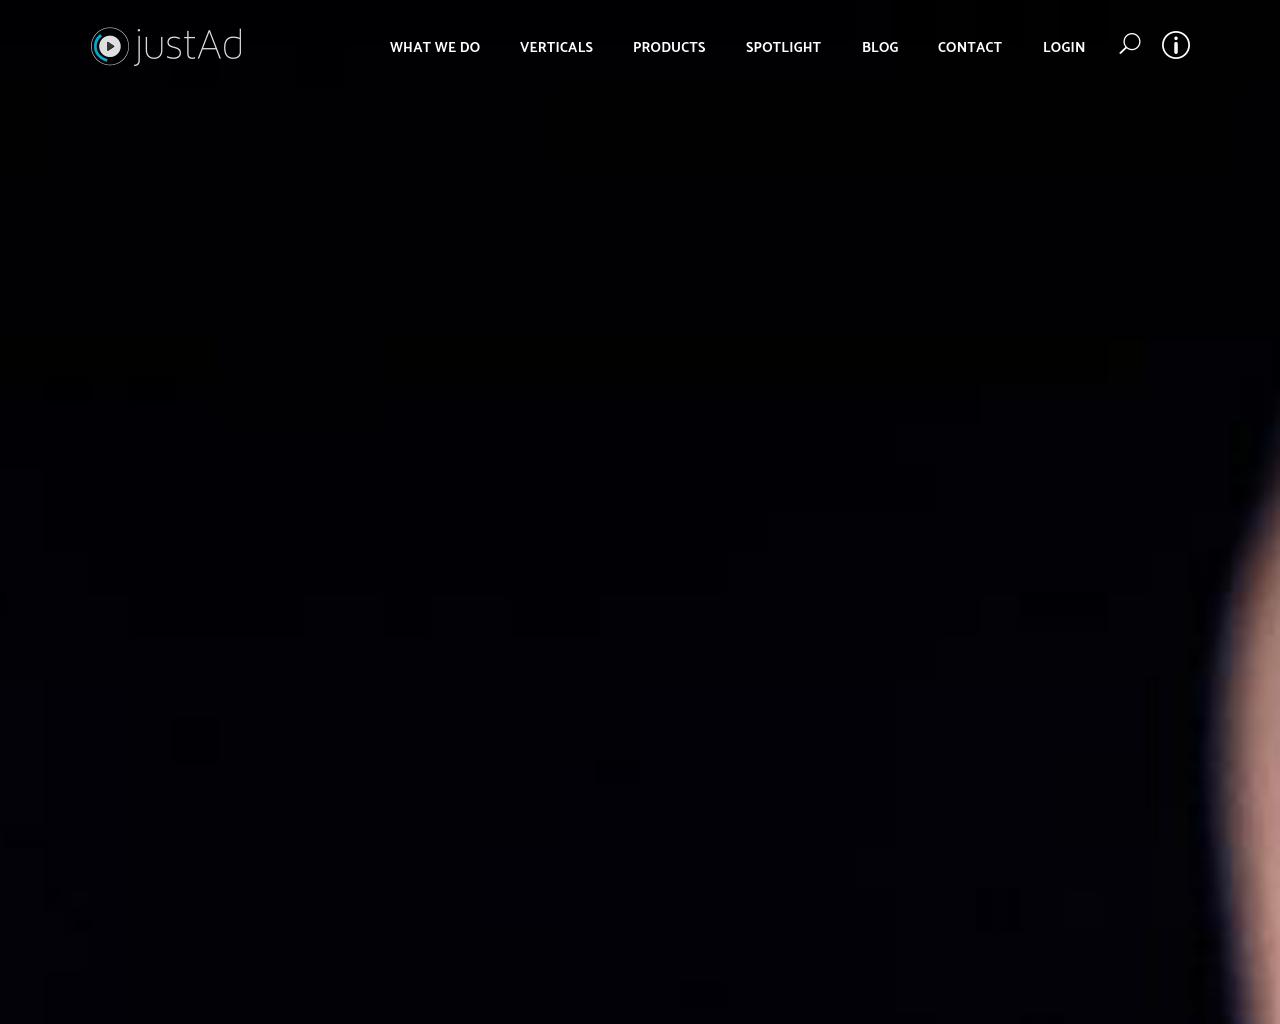 justAd-Advertising-Reviews-Pricing